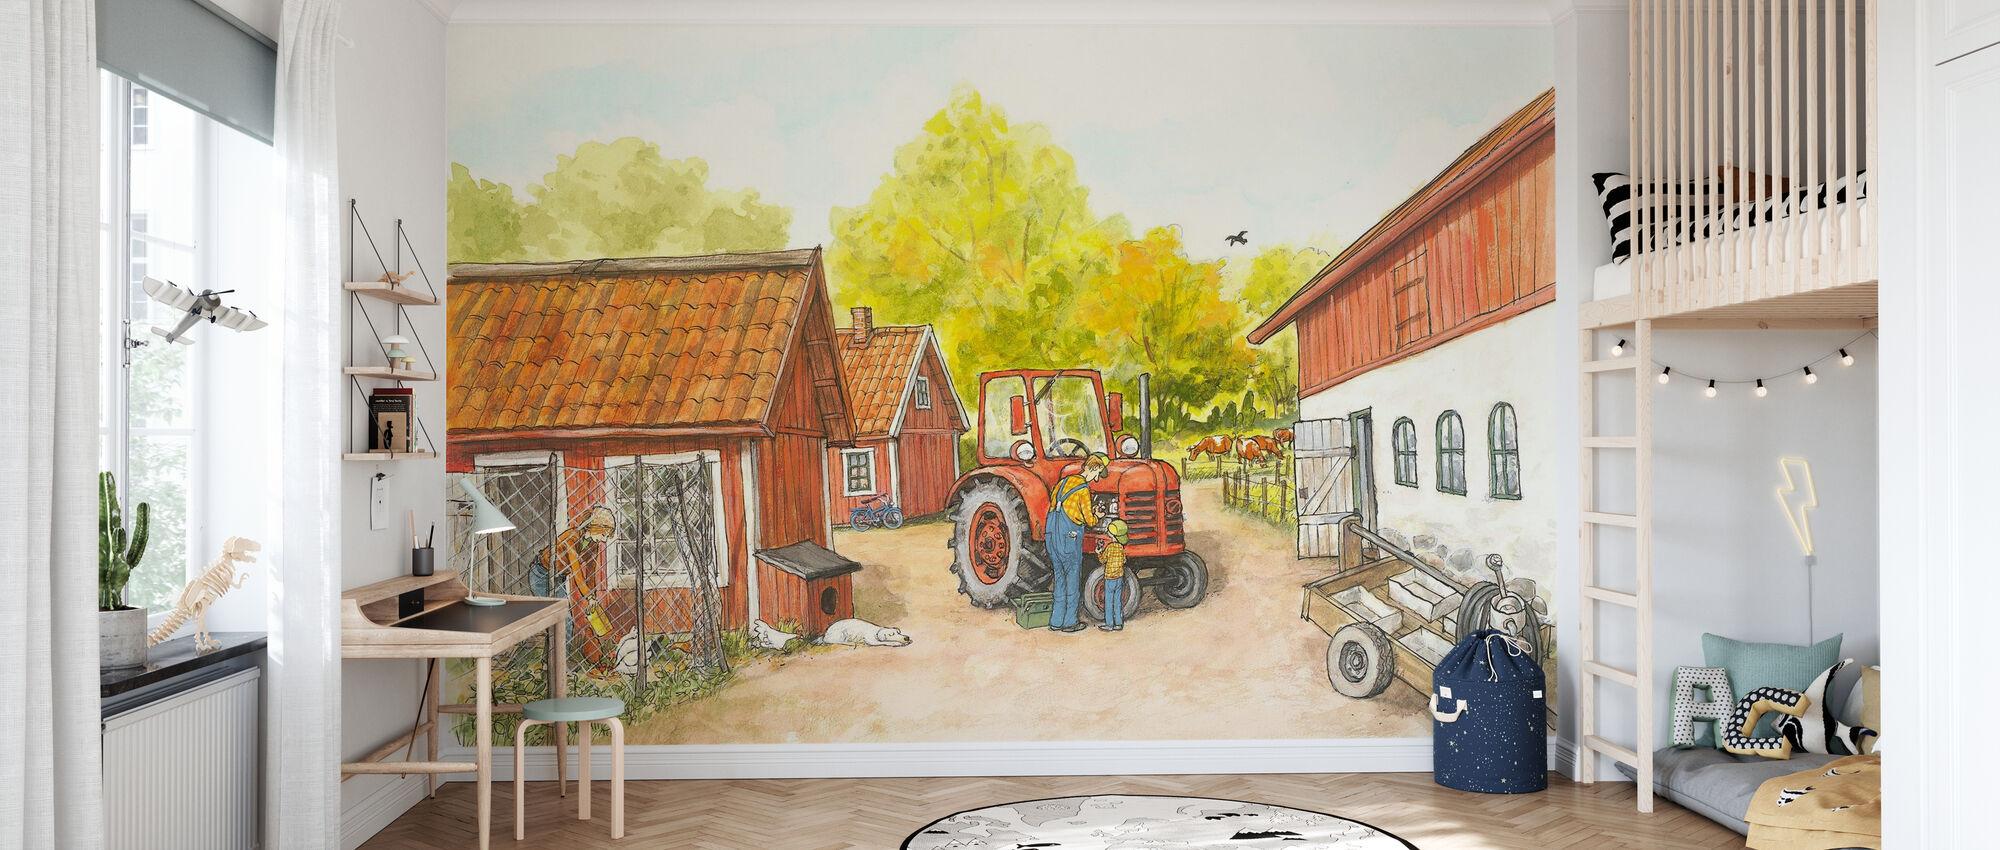 Moeder mu & kraai - De boerderij - Behang - Kinderkamer